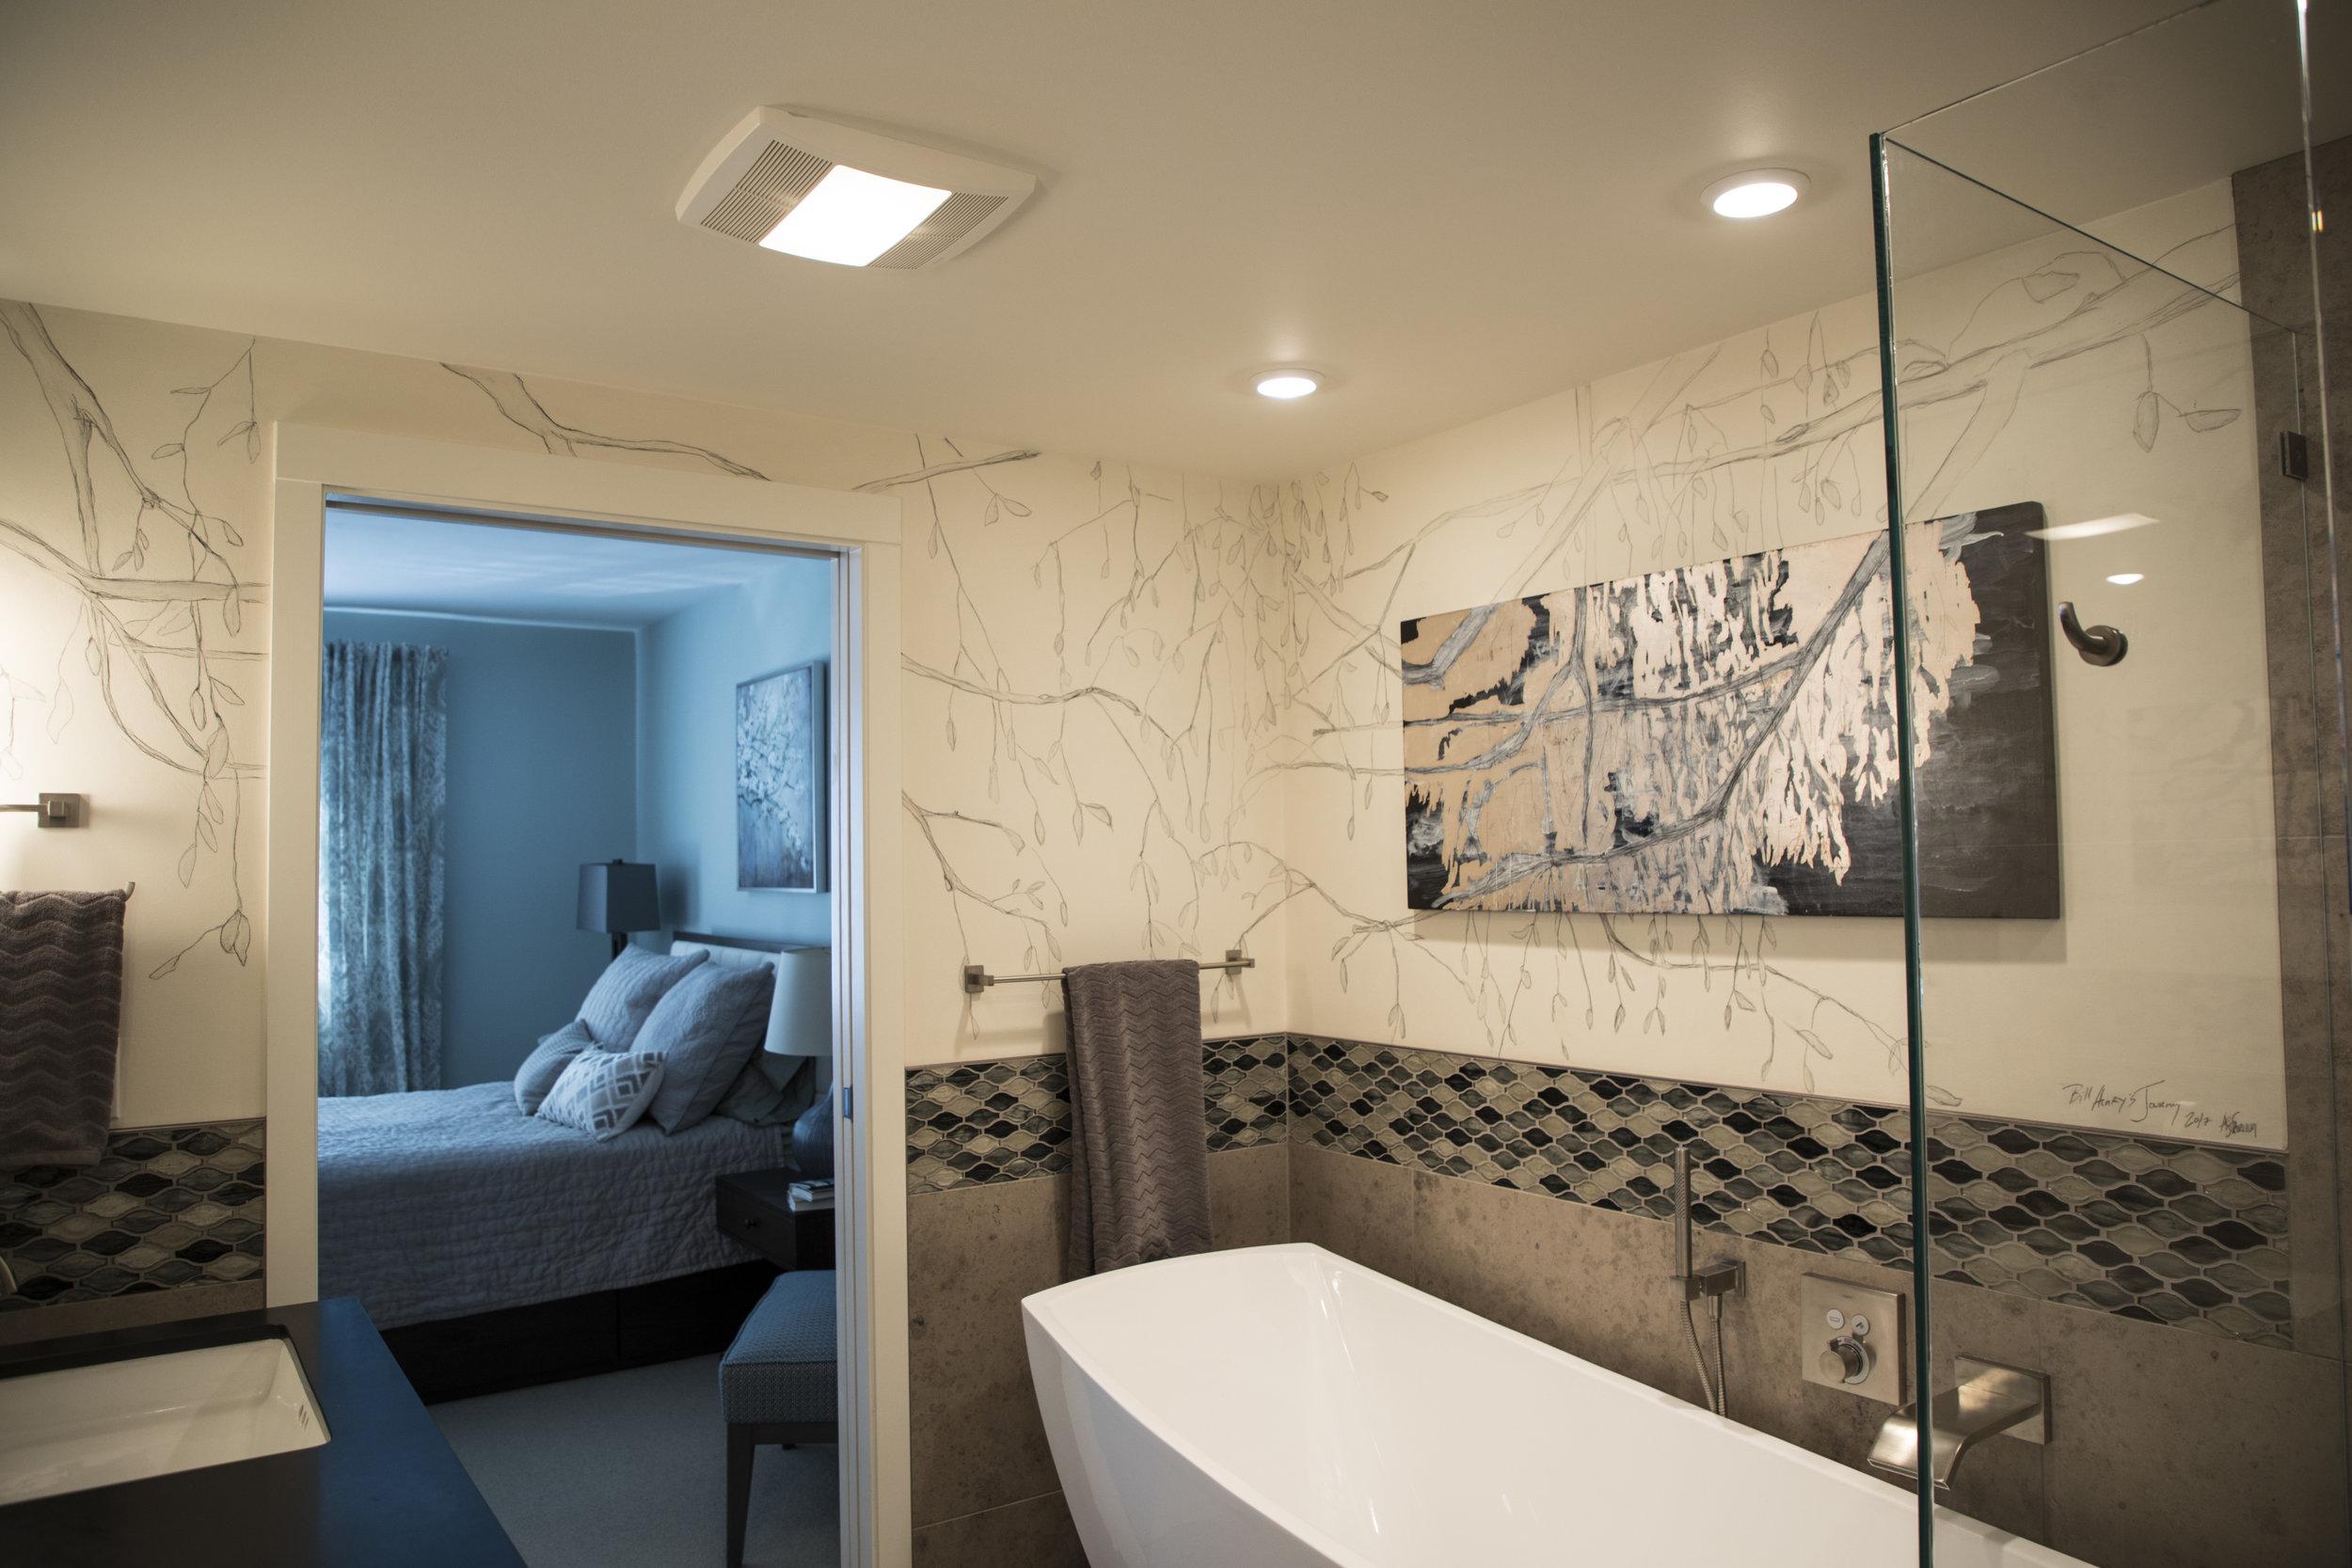 Bath, Bill Henry's Journey